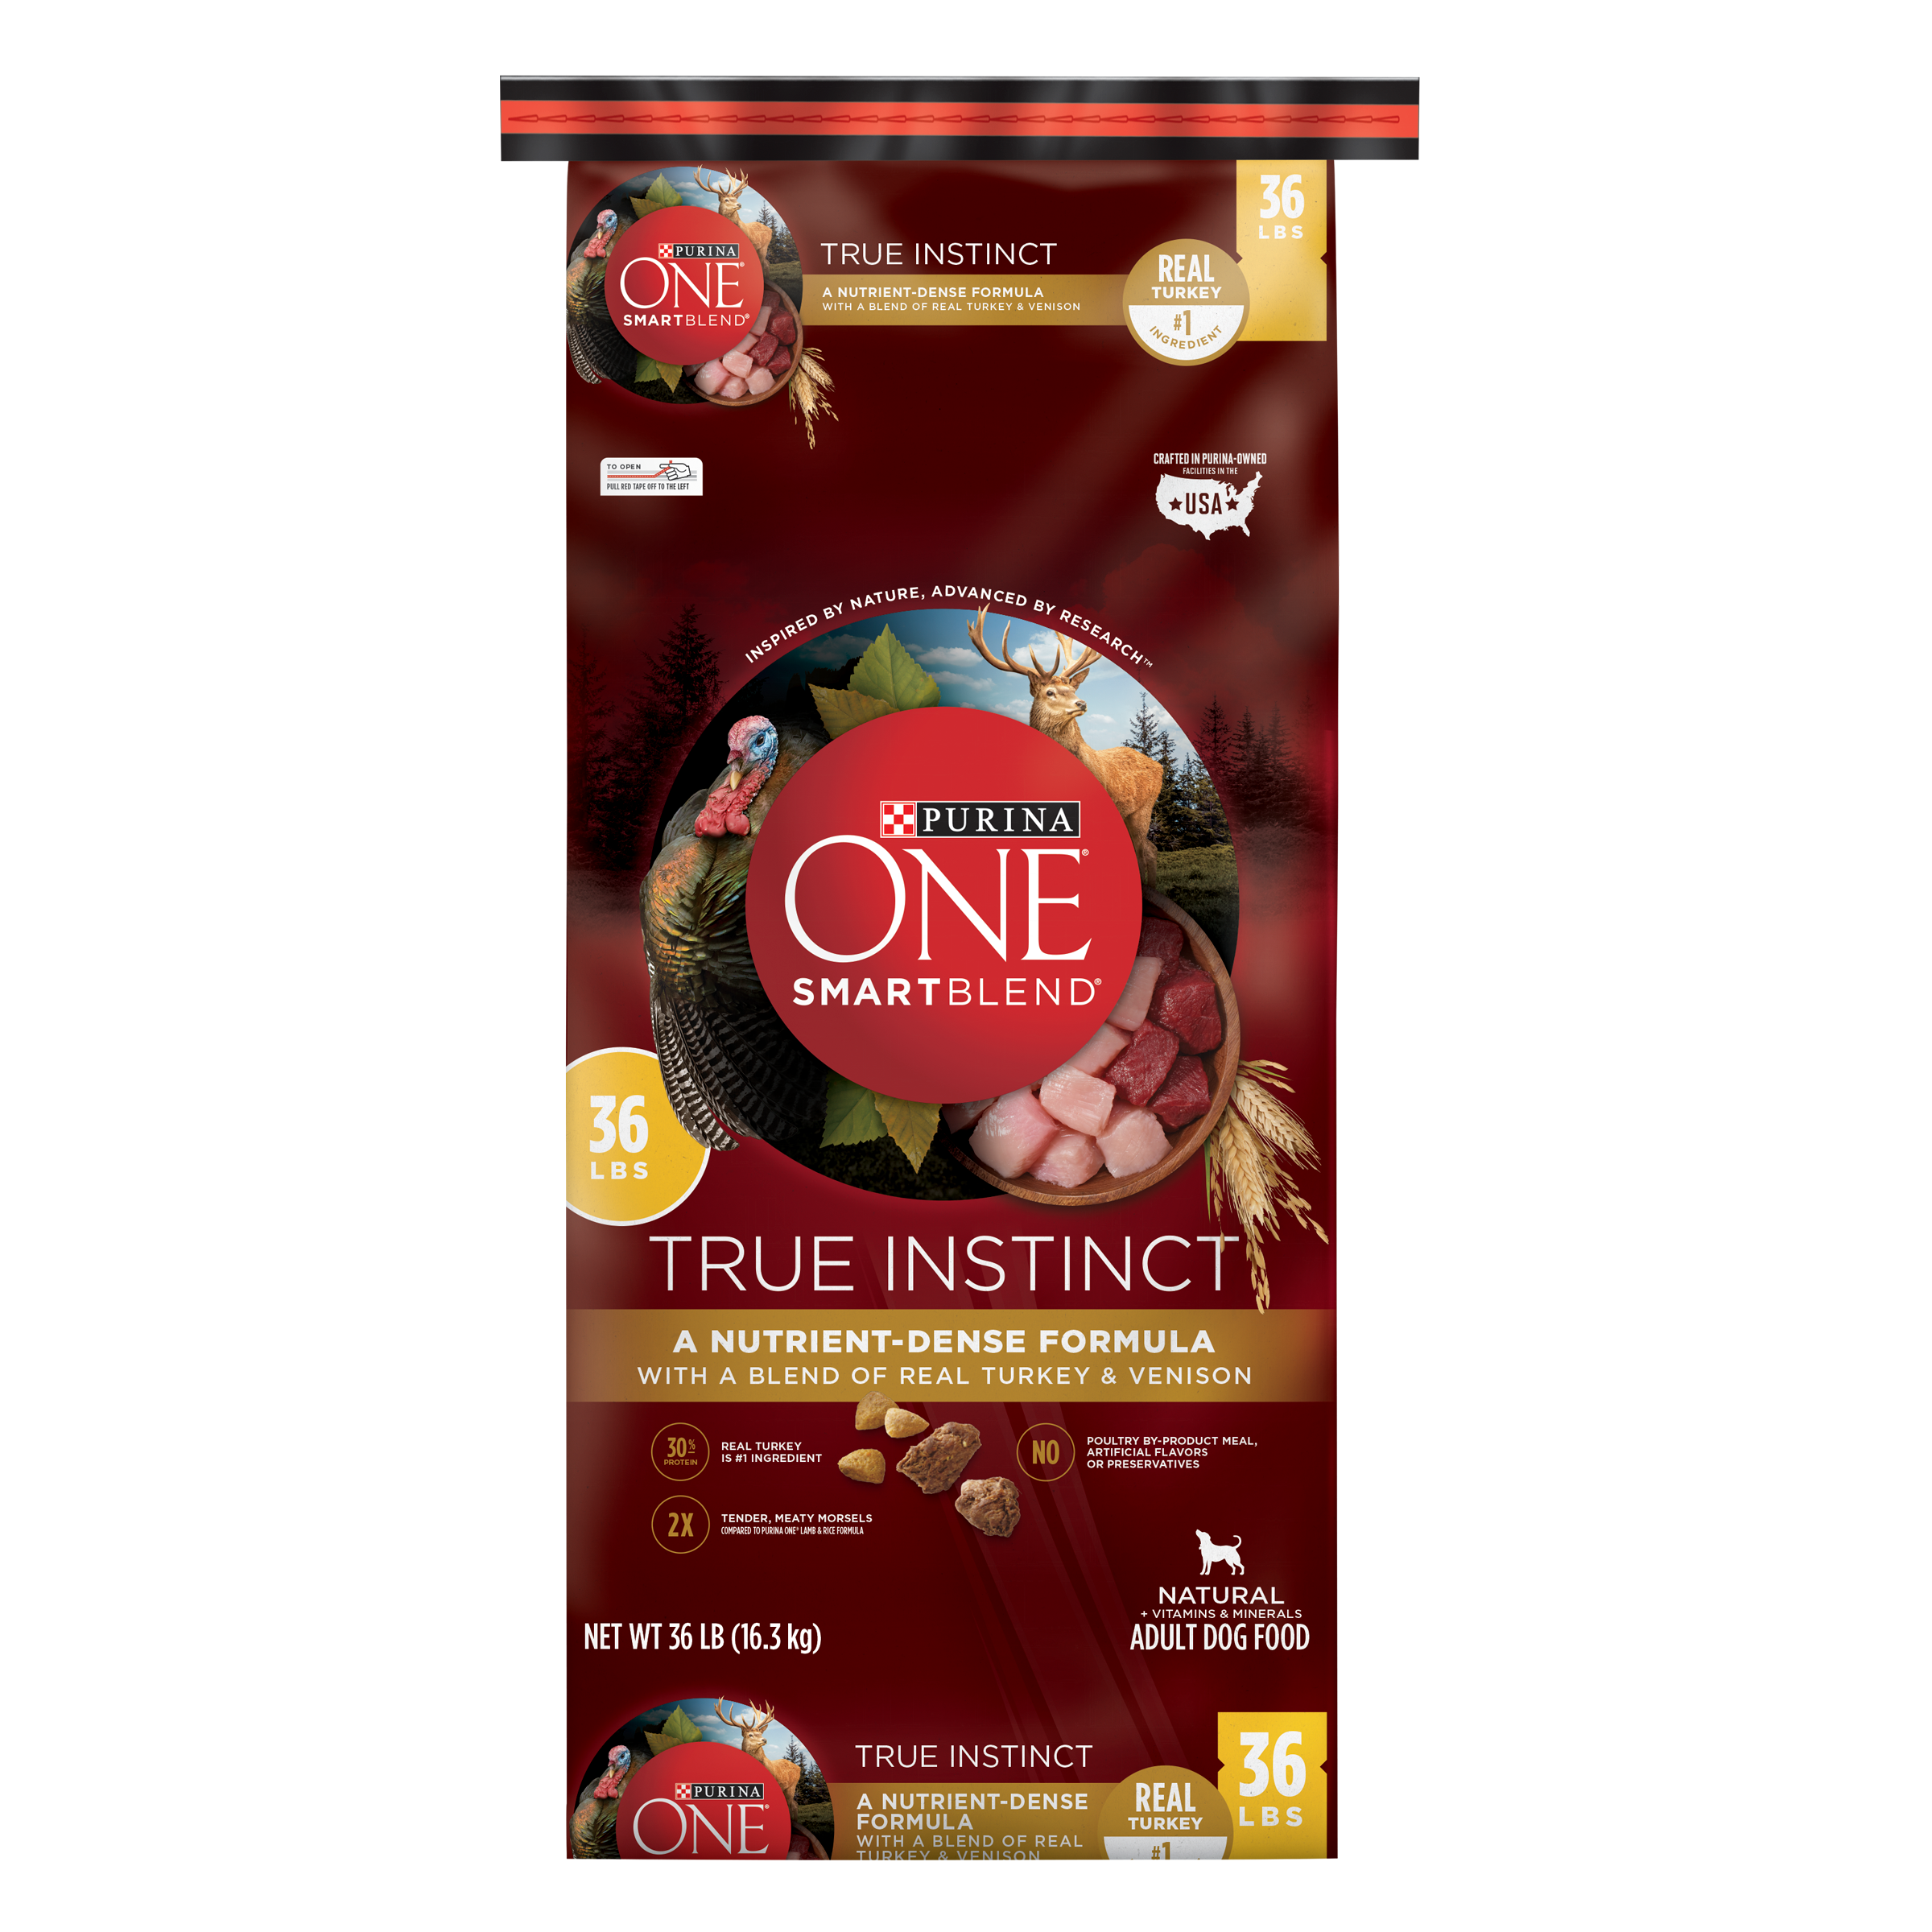 Purina ONE SmartBlend True Instinct Natural With Real Turkey & Venison Adult Dry Dog Food - 36 lb. Bag